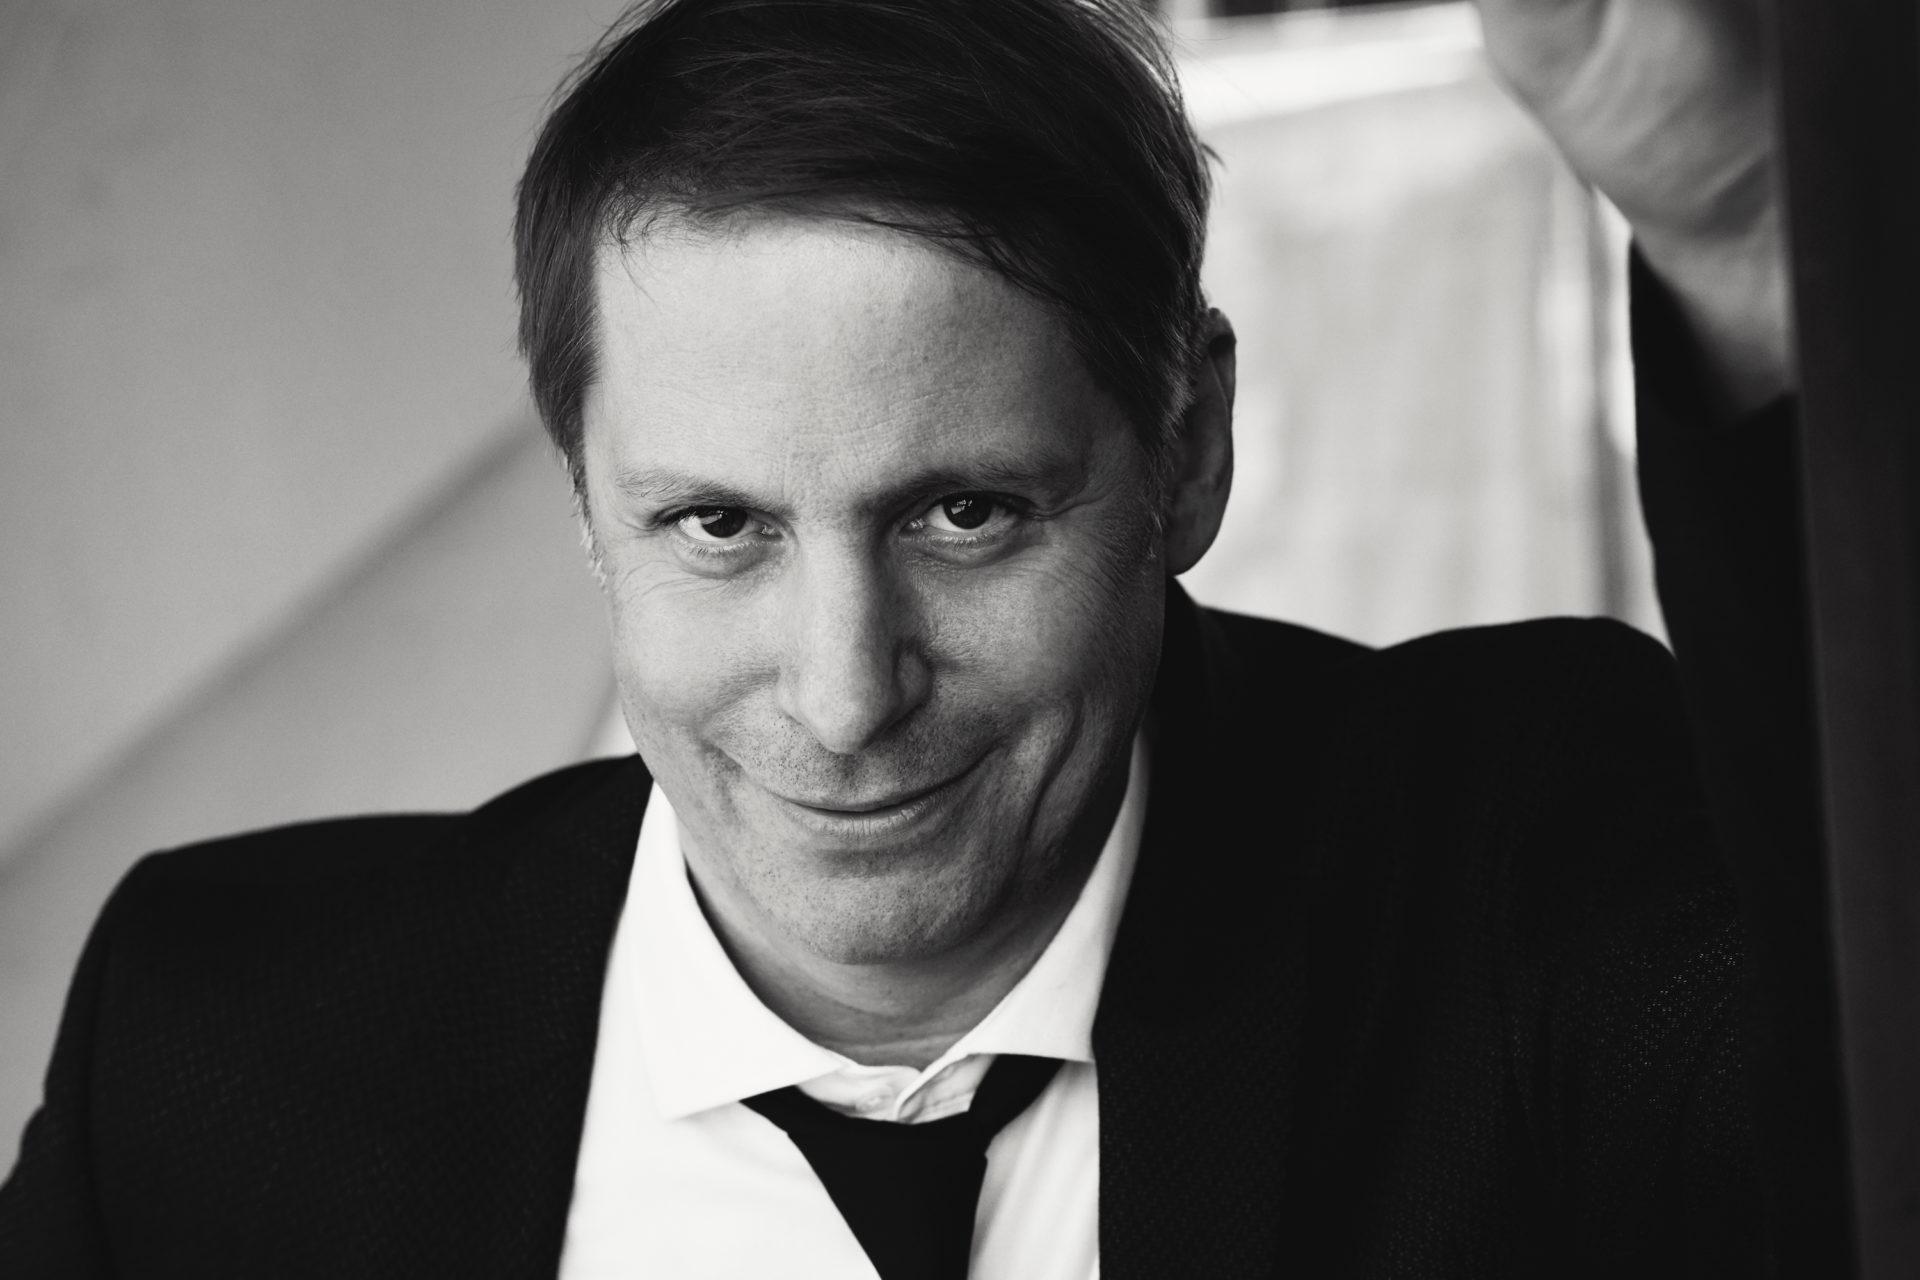 Johannes Richard Voelkel